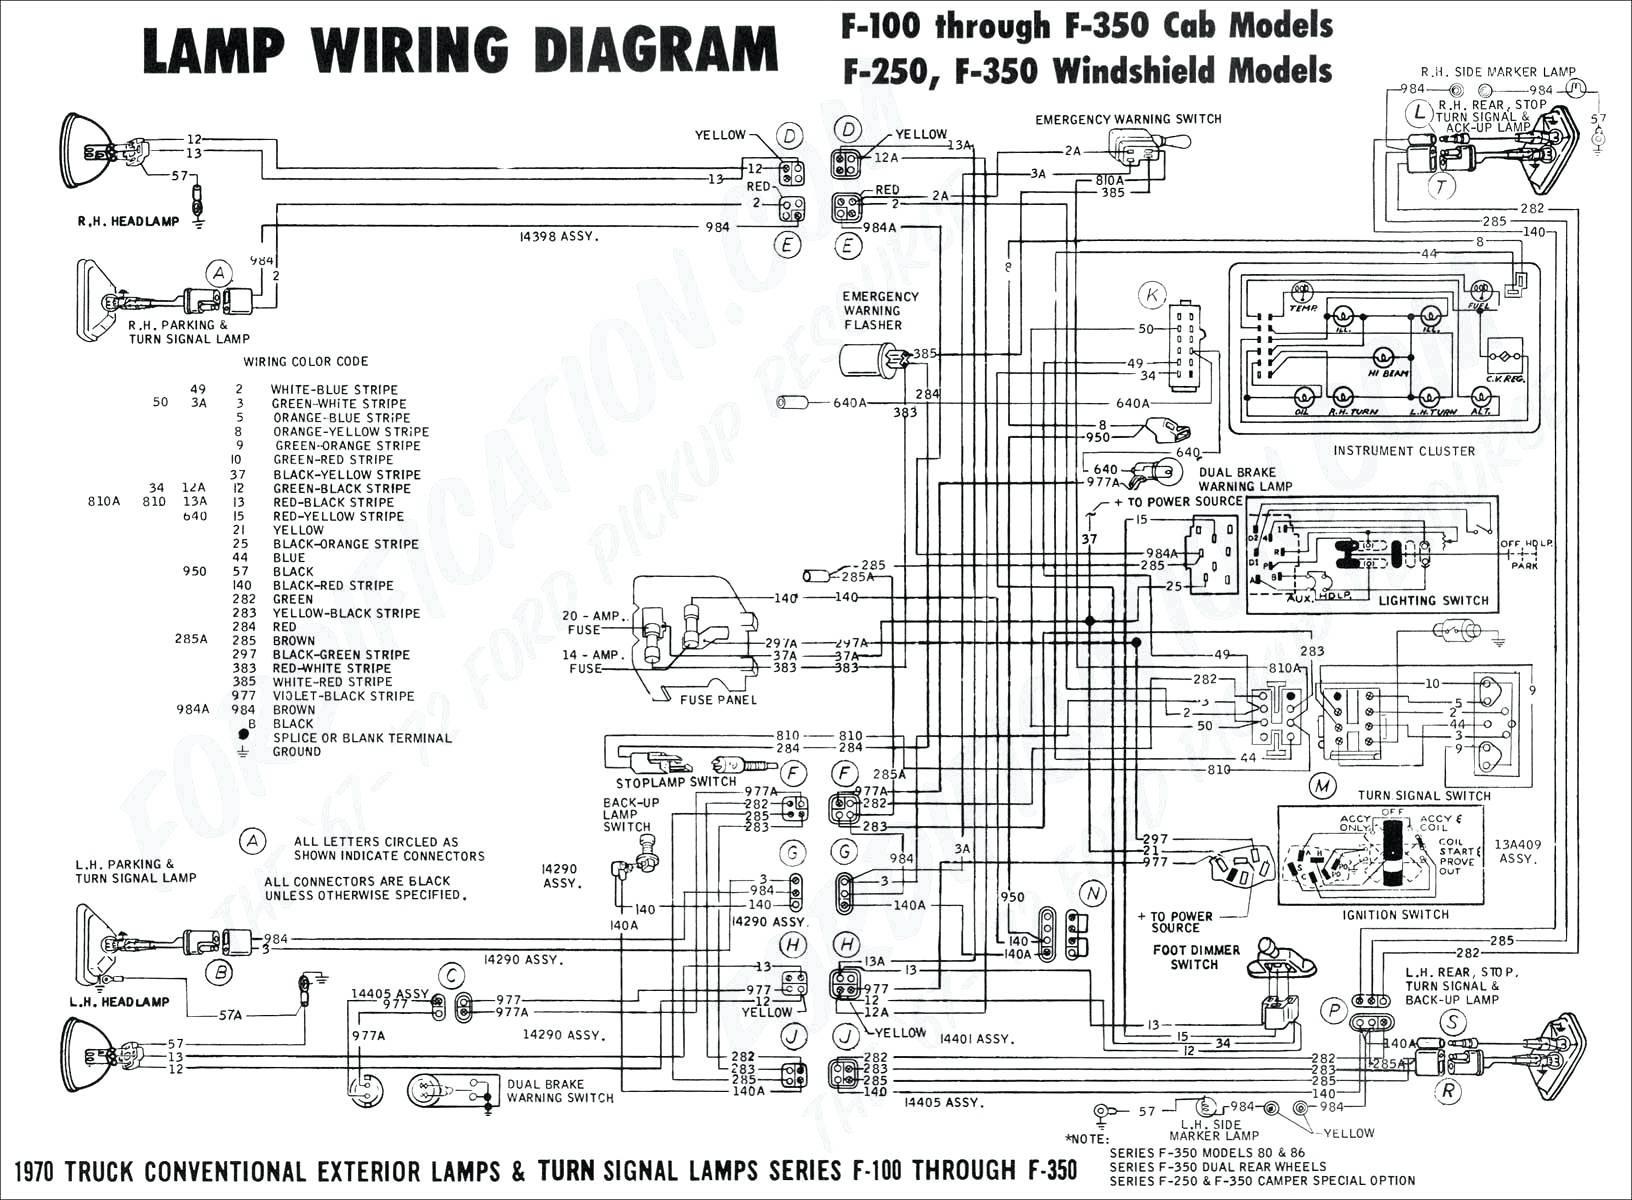 Groovy Ford F350 Trailer Wiring Diagram Sample Wiring Diagram Sample Wiring Cloud Domeilariaidewilluminateatxorg